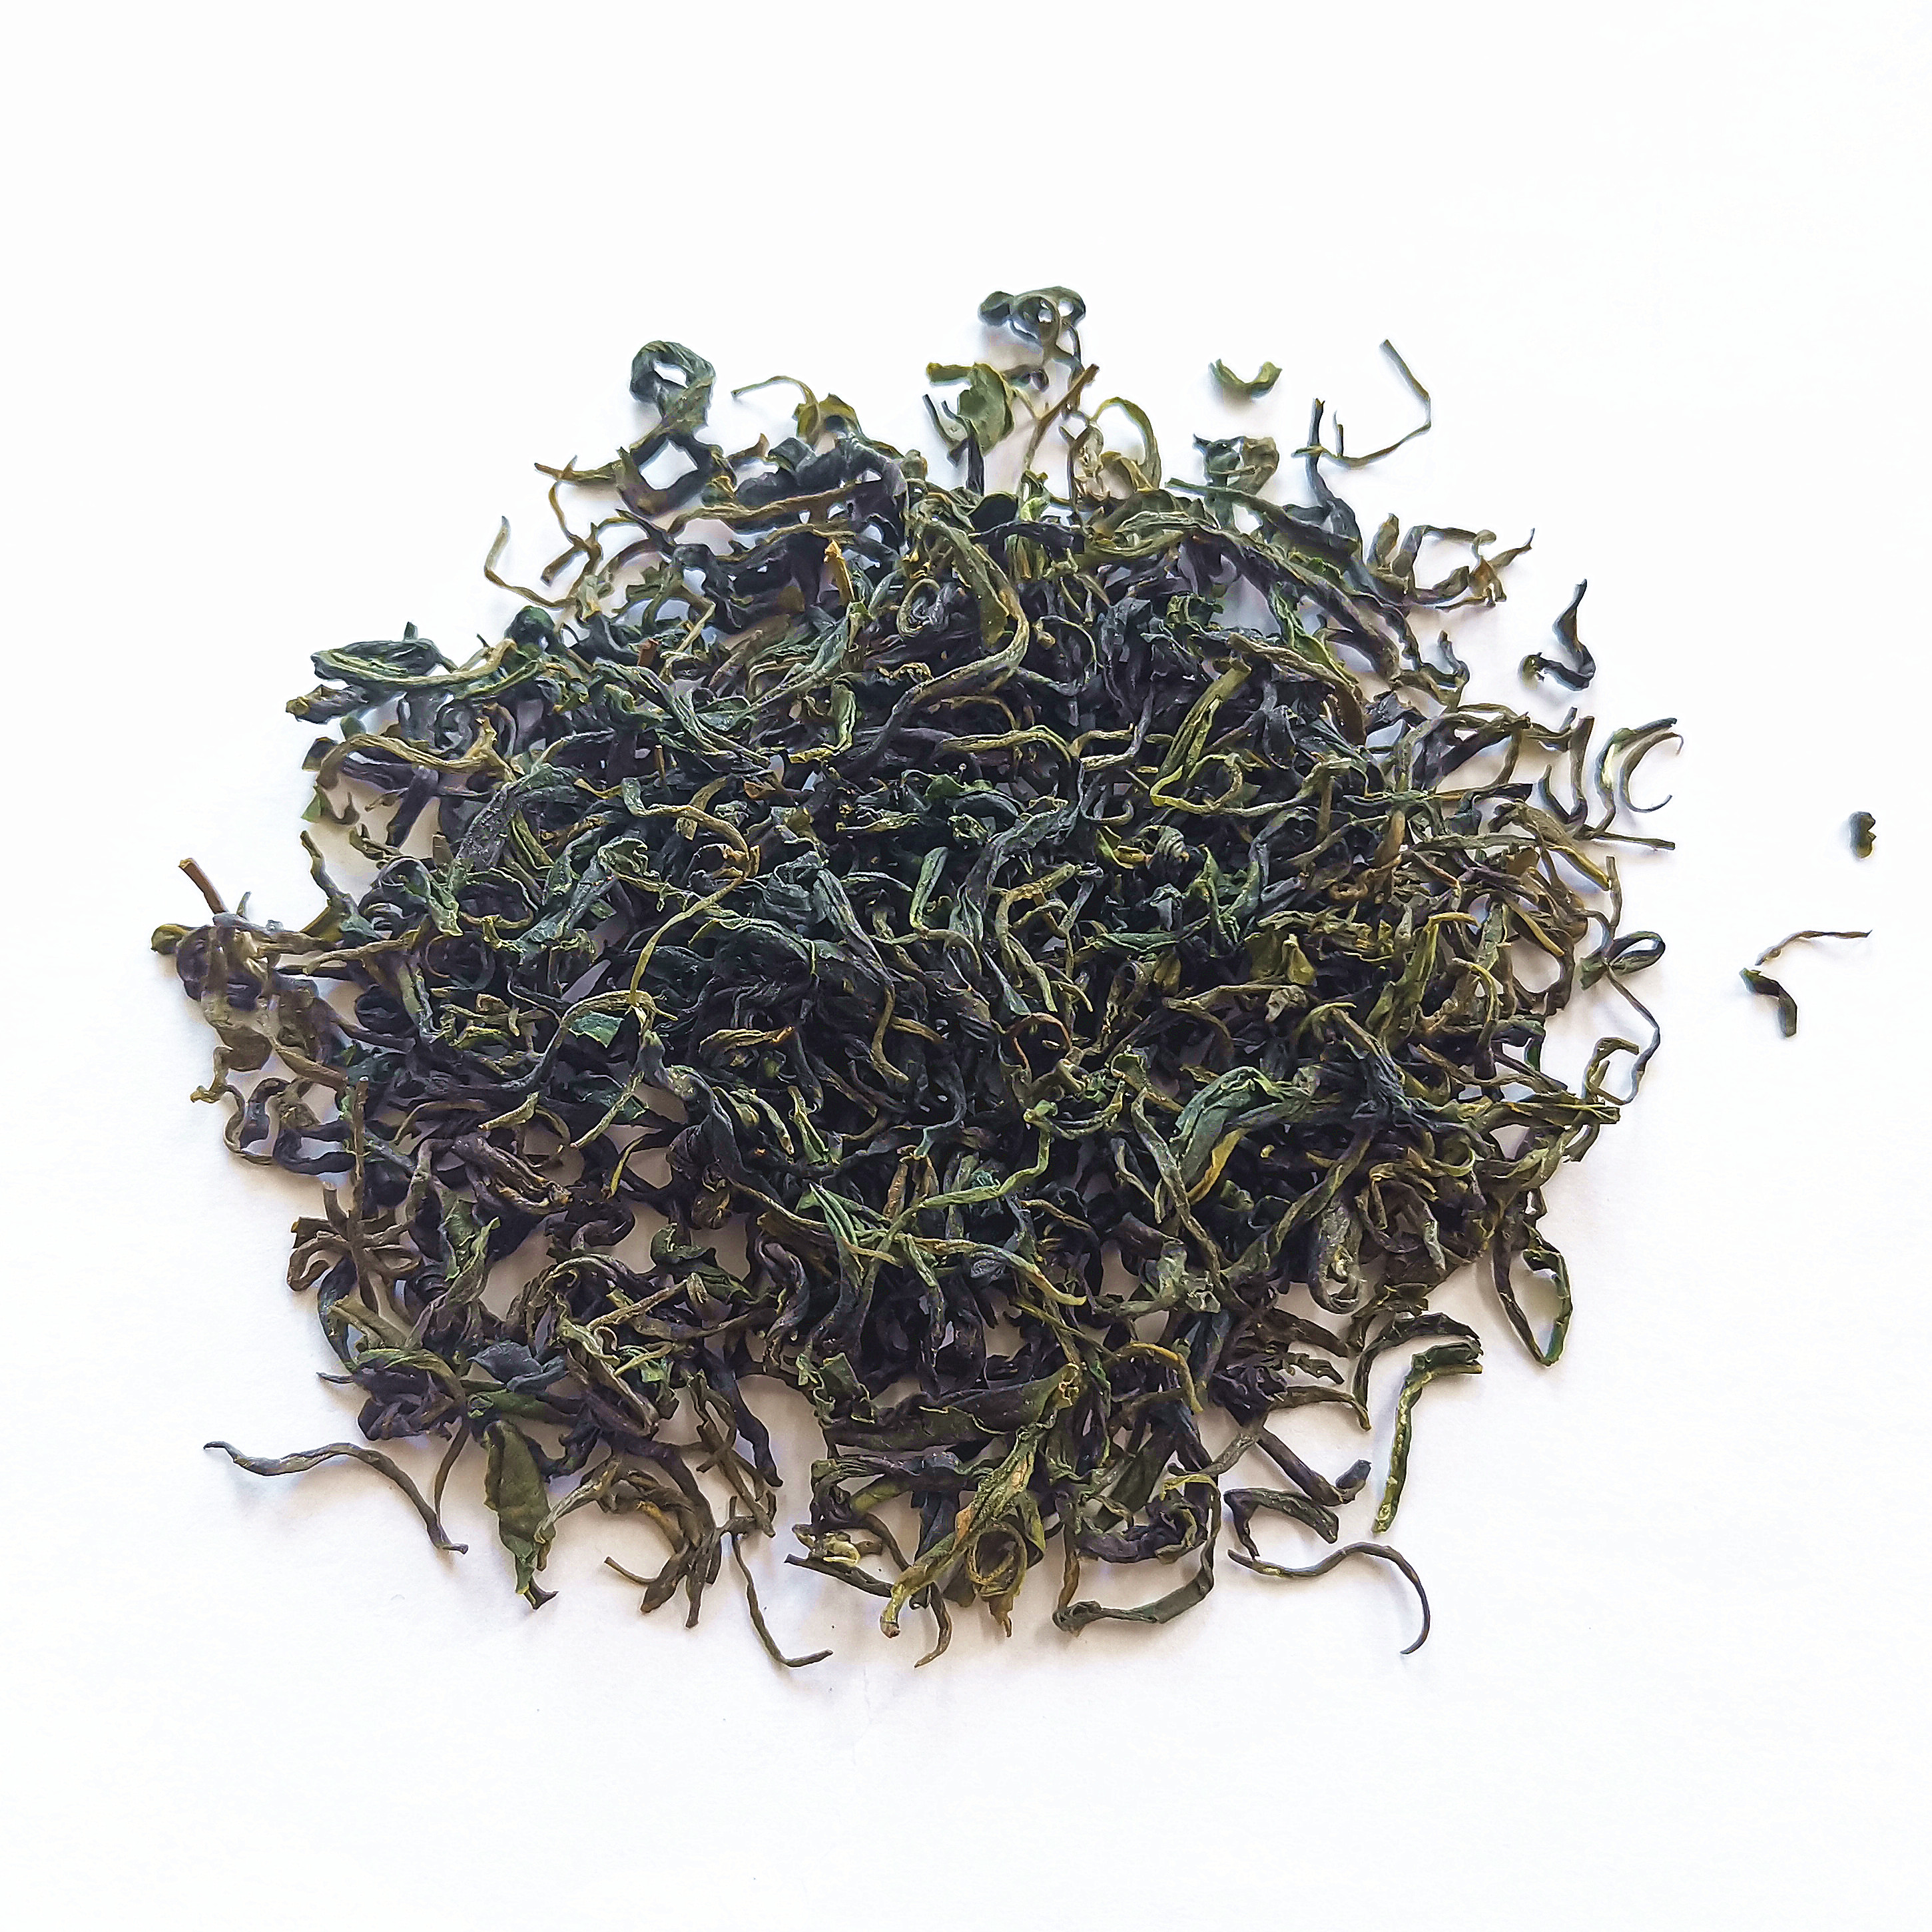 Best tea websites organic private label define tea green - 4uTea | 4uTea.com